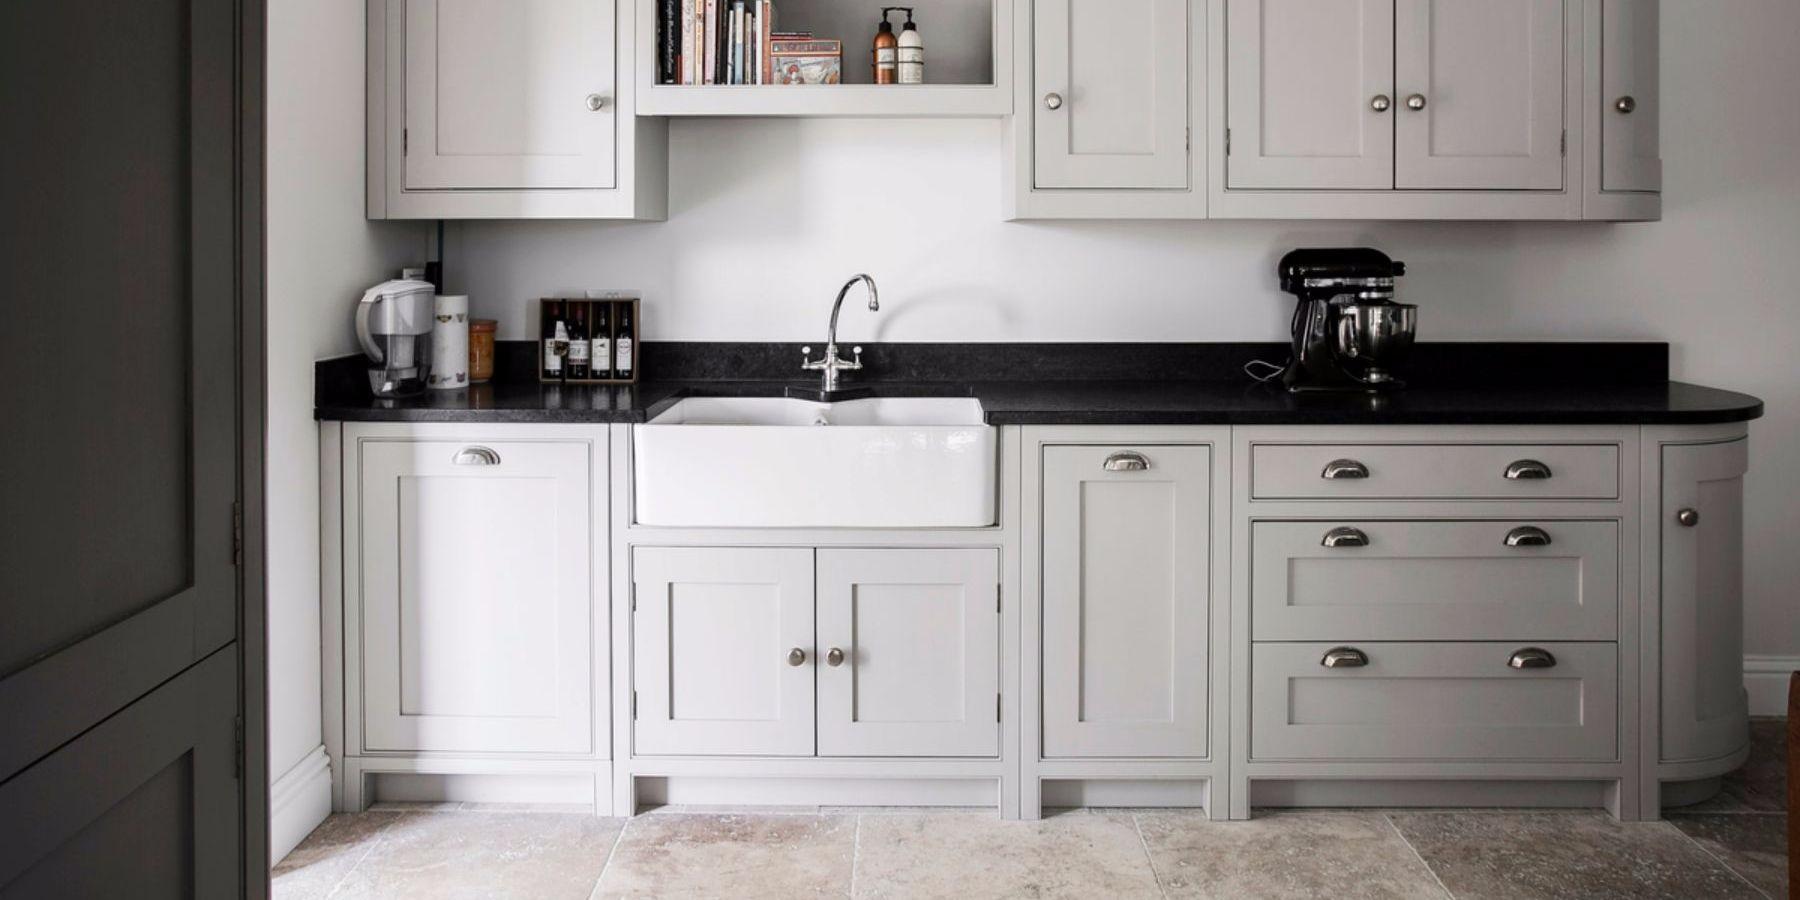 Handmade Freestanding Kitchens | Bespoke Kitchens | Burlanes ...